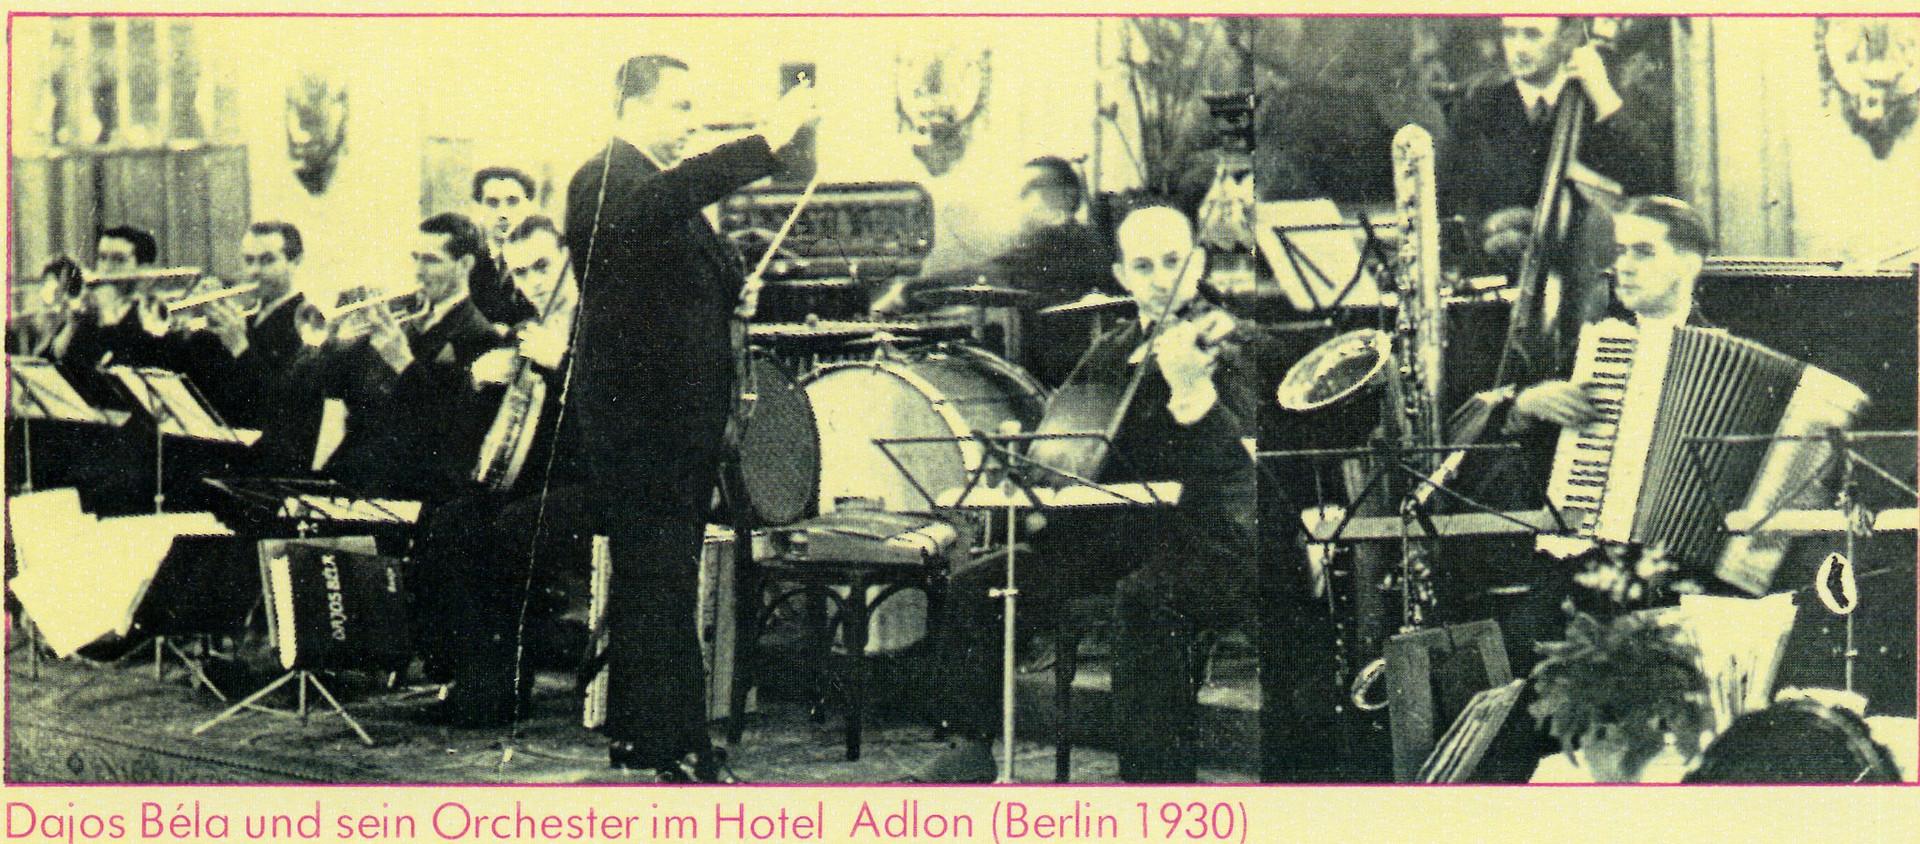 AH orchestra edited.jpg